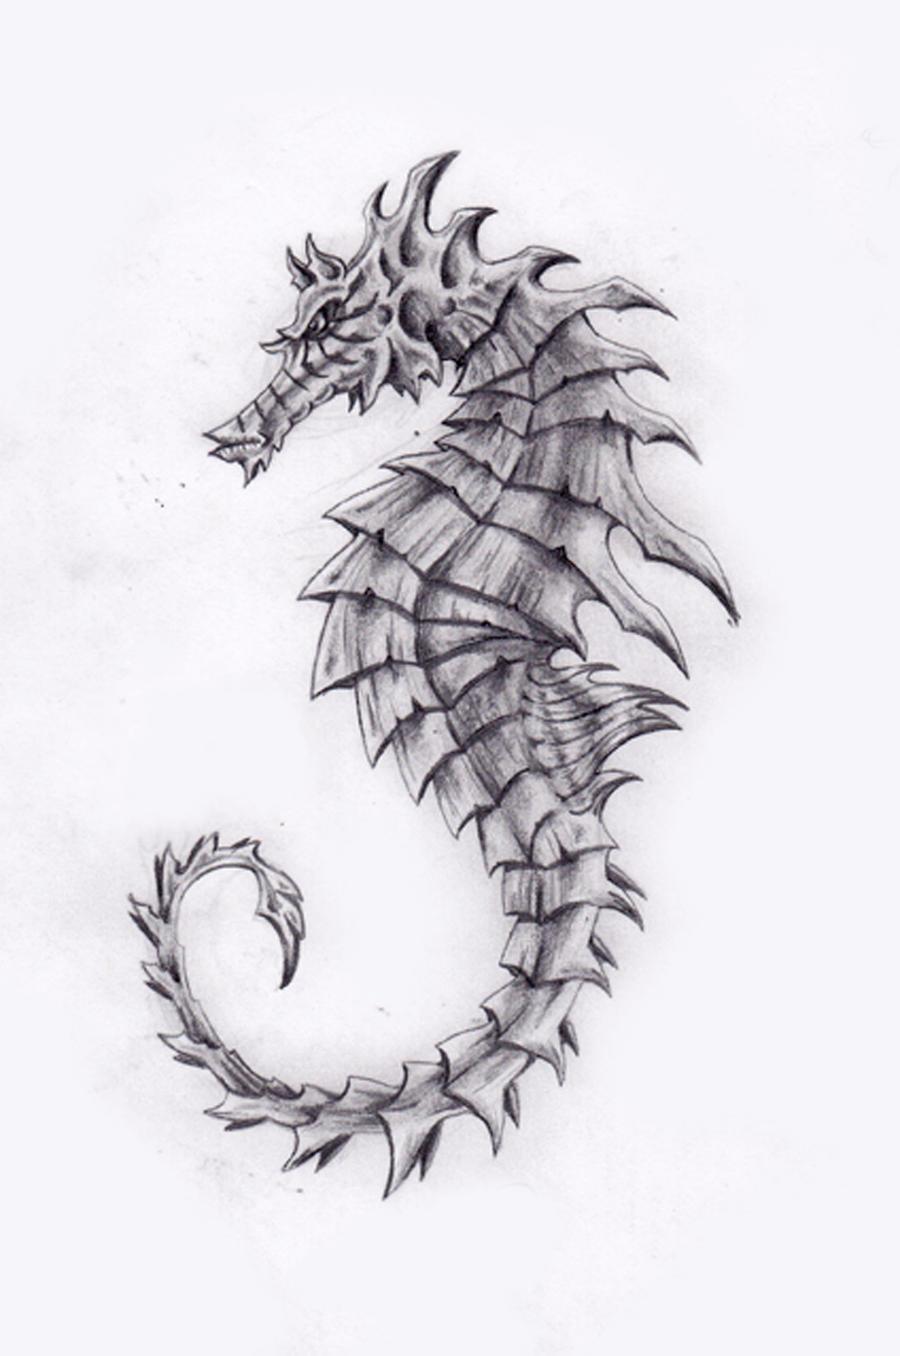 Seahorse by roerjm on DeviantArt